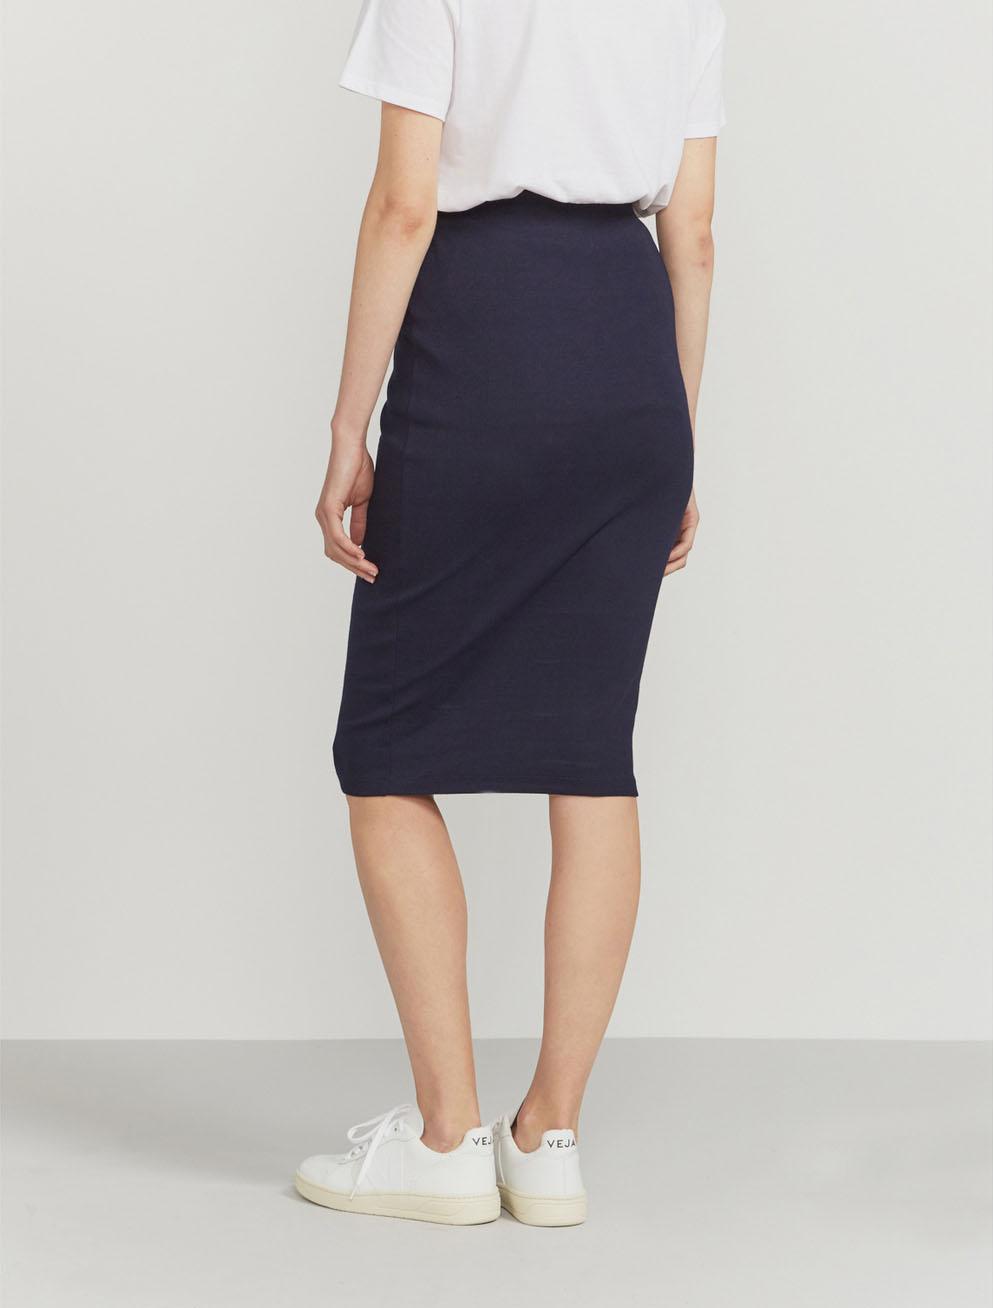 Ribbed stretch skirt